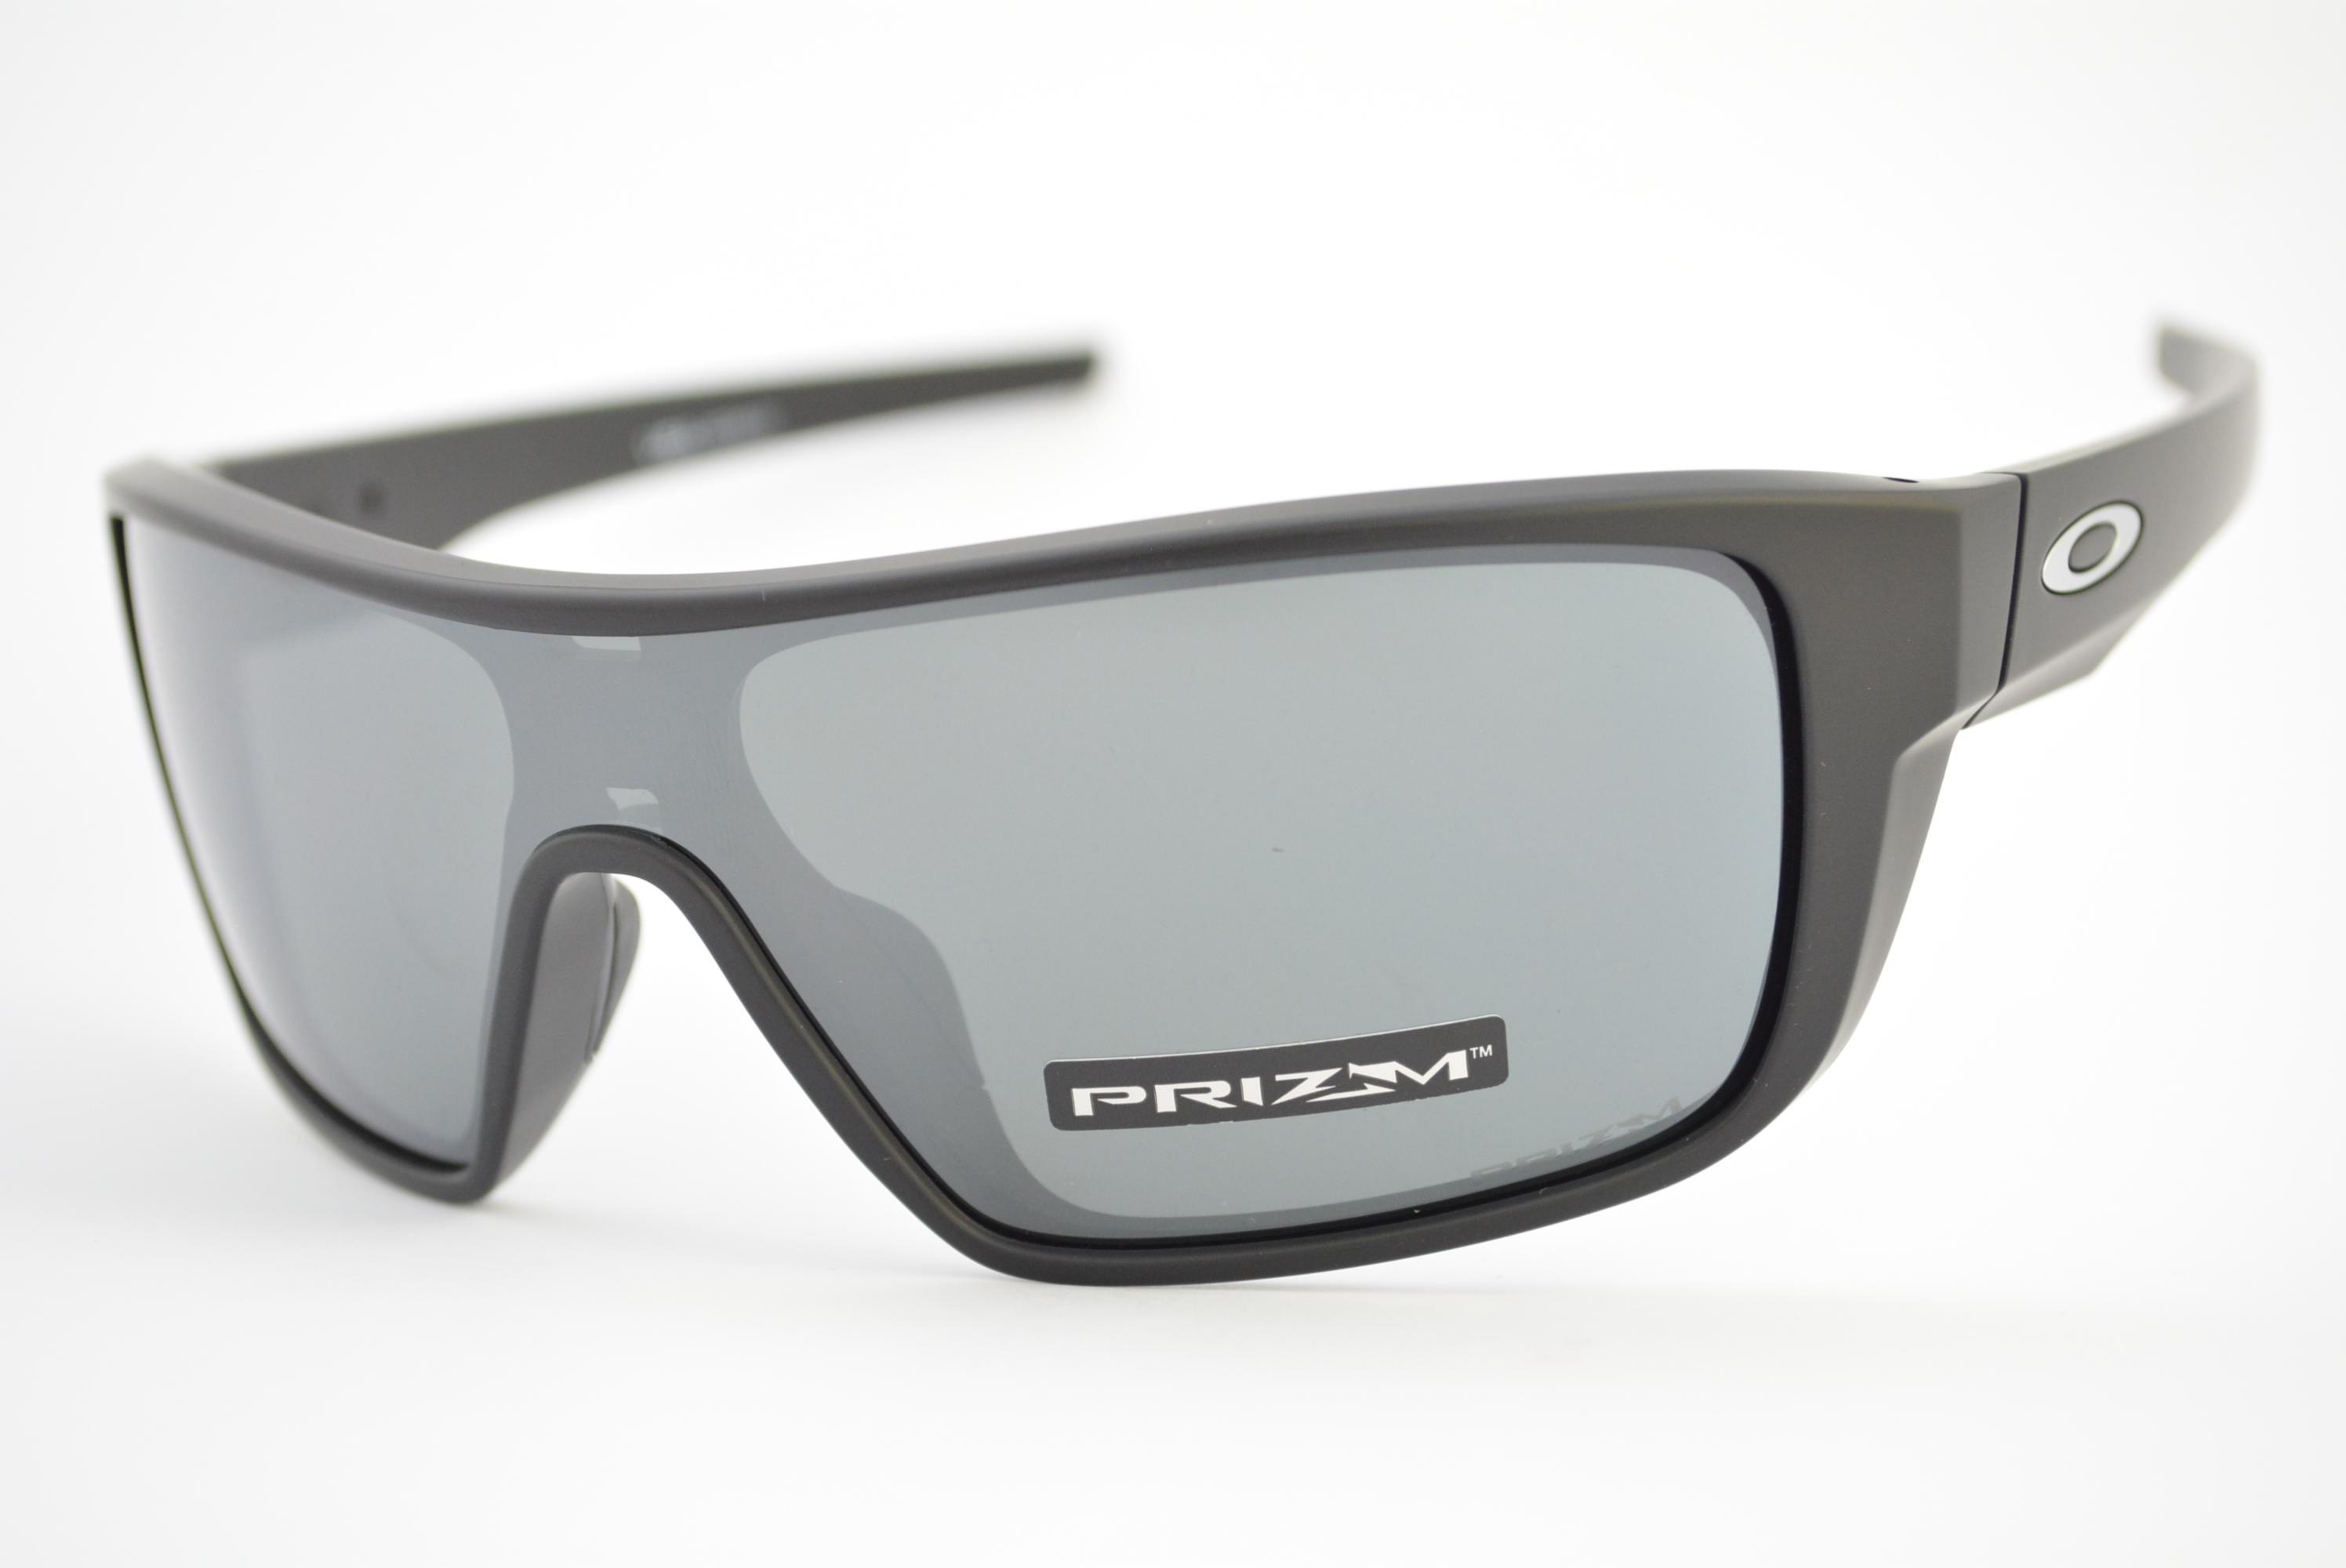 b90834d39a543 óculos de sol Oakley mod Straight Back matte black w prizm black iridium  9411-